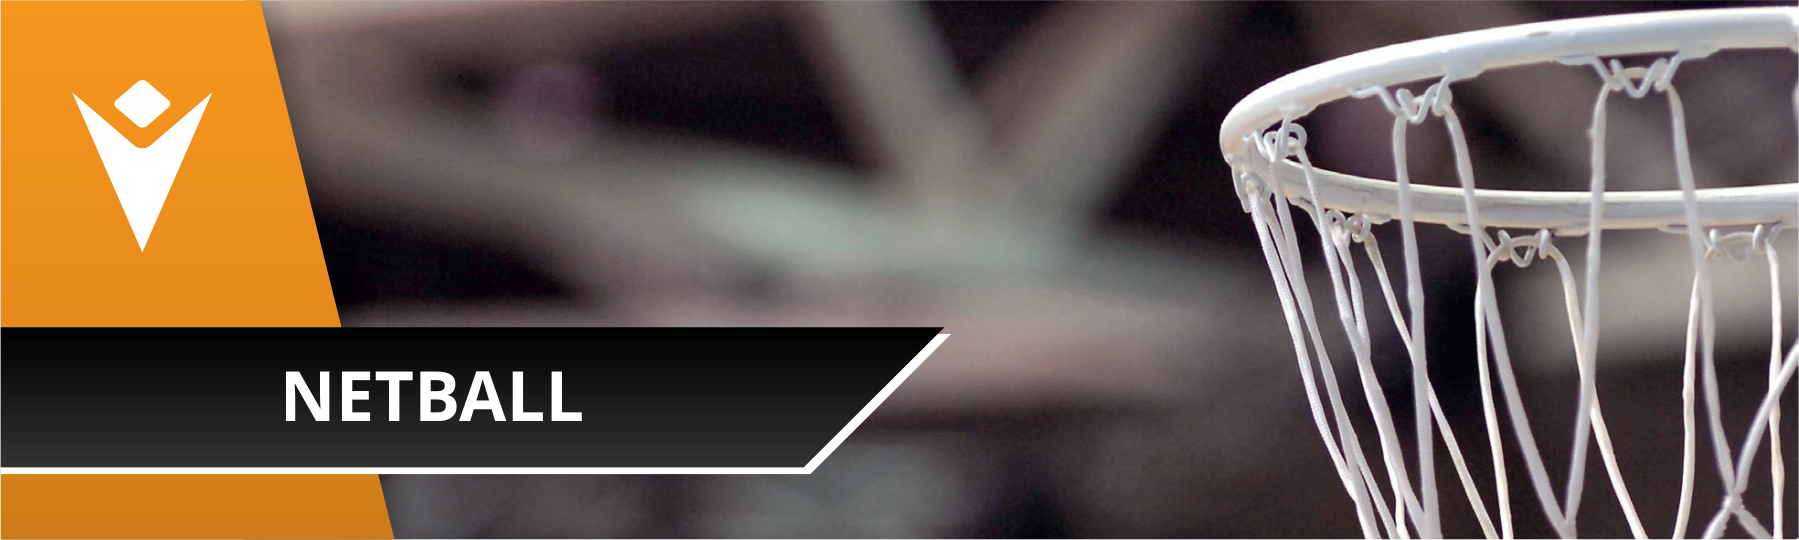 netball-banner-new.png